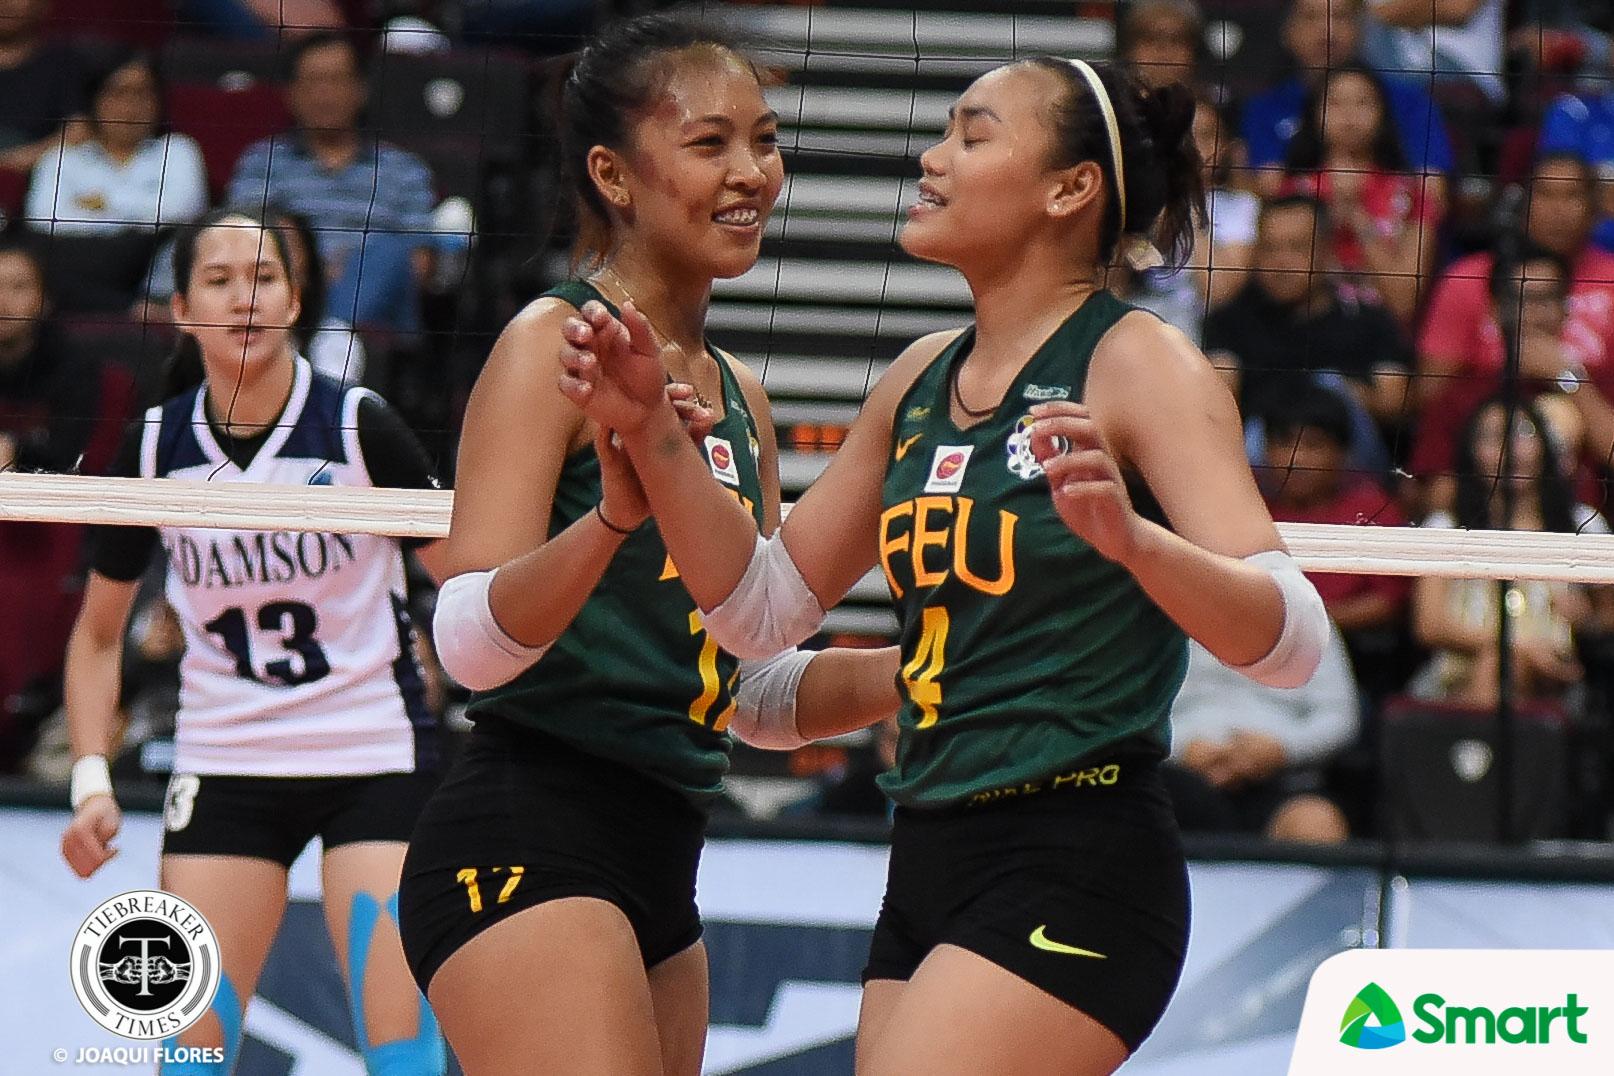 UAAP-80-Volleyball-FEU-vs.-ADU-Negrito-2878 FEU looks back on Lady Tamaraws triumphs and defeats with new book FEU News UAAP Volleyball  - philippine sports news